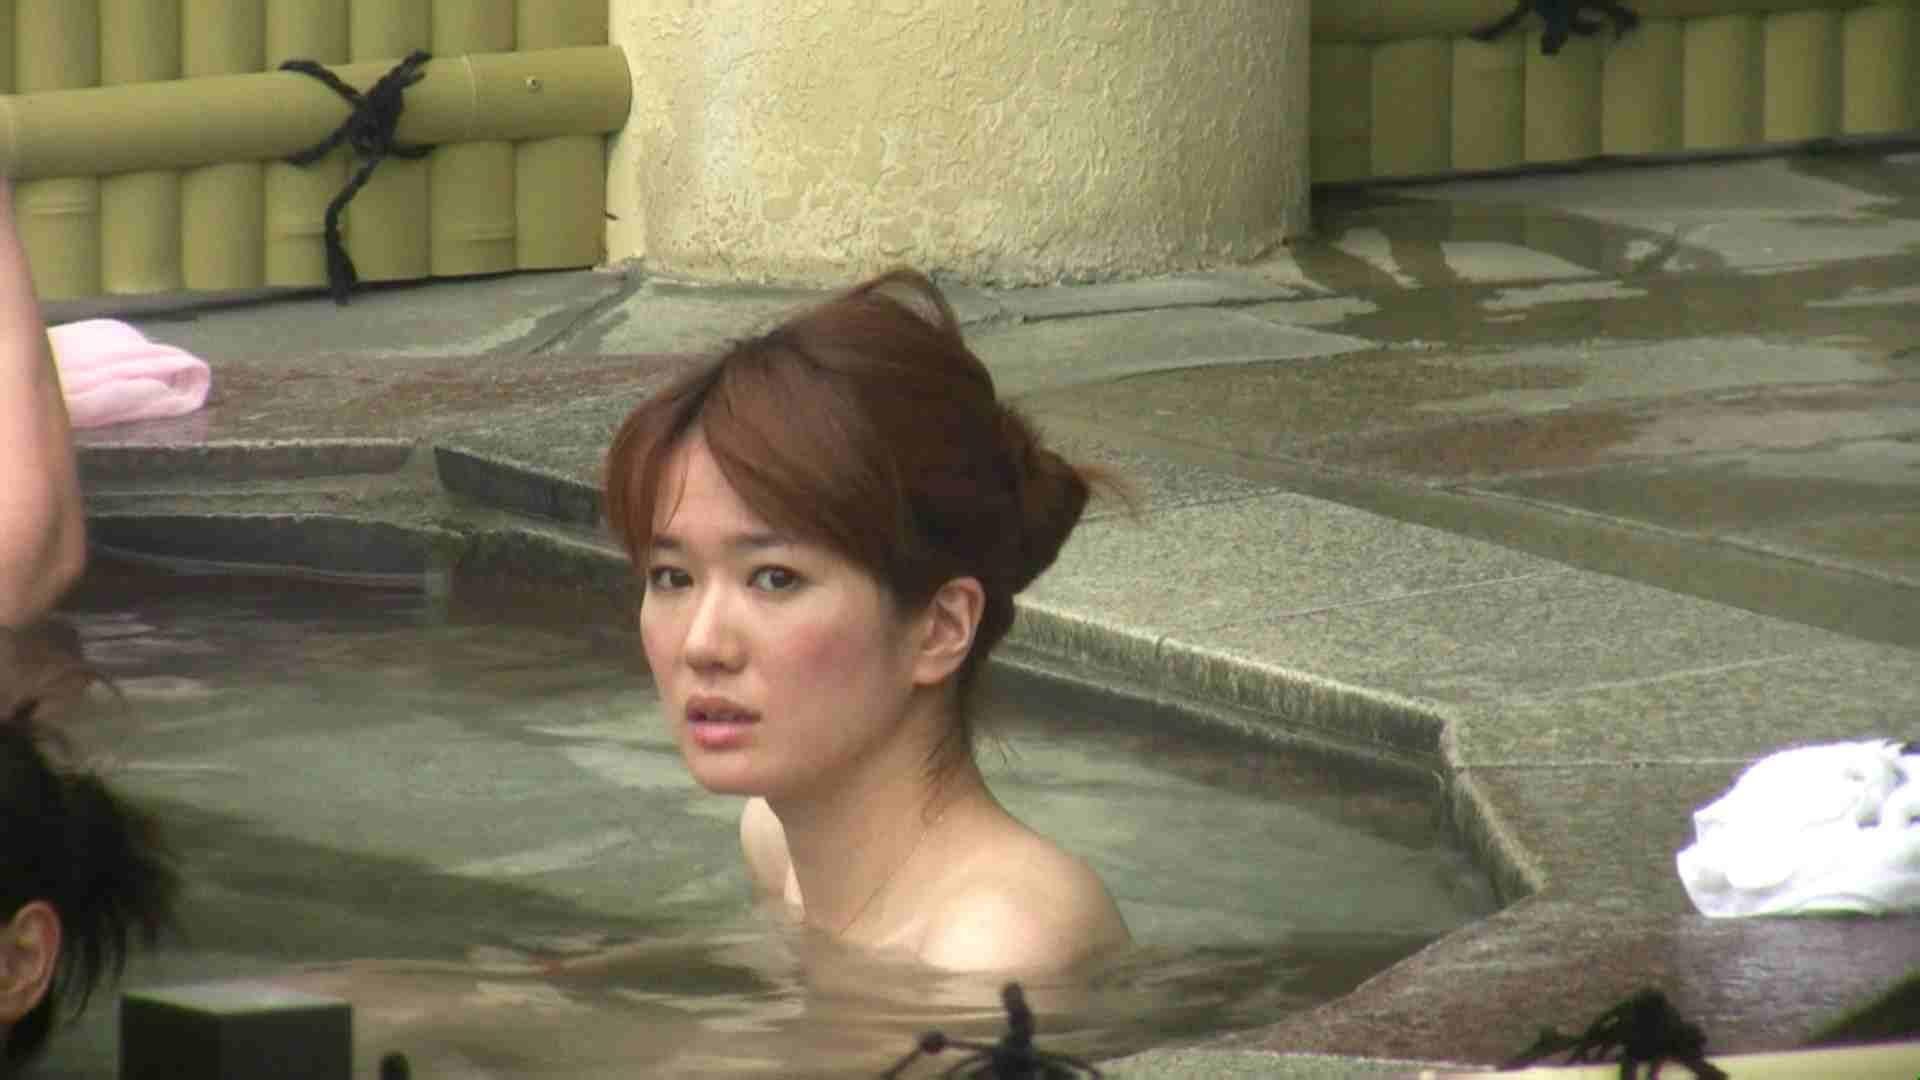 Aquaな露天風呂Vol.110 HなOL のぞき動画キャプチャ 89pic 2